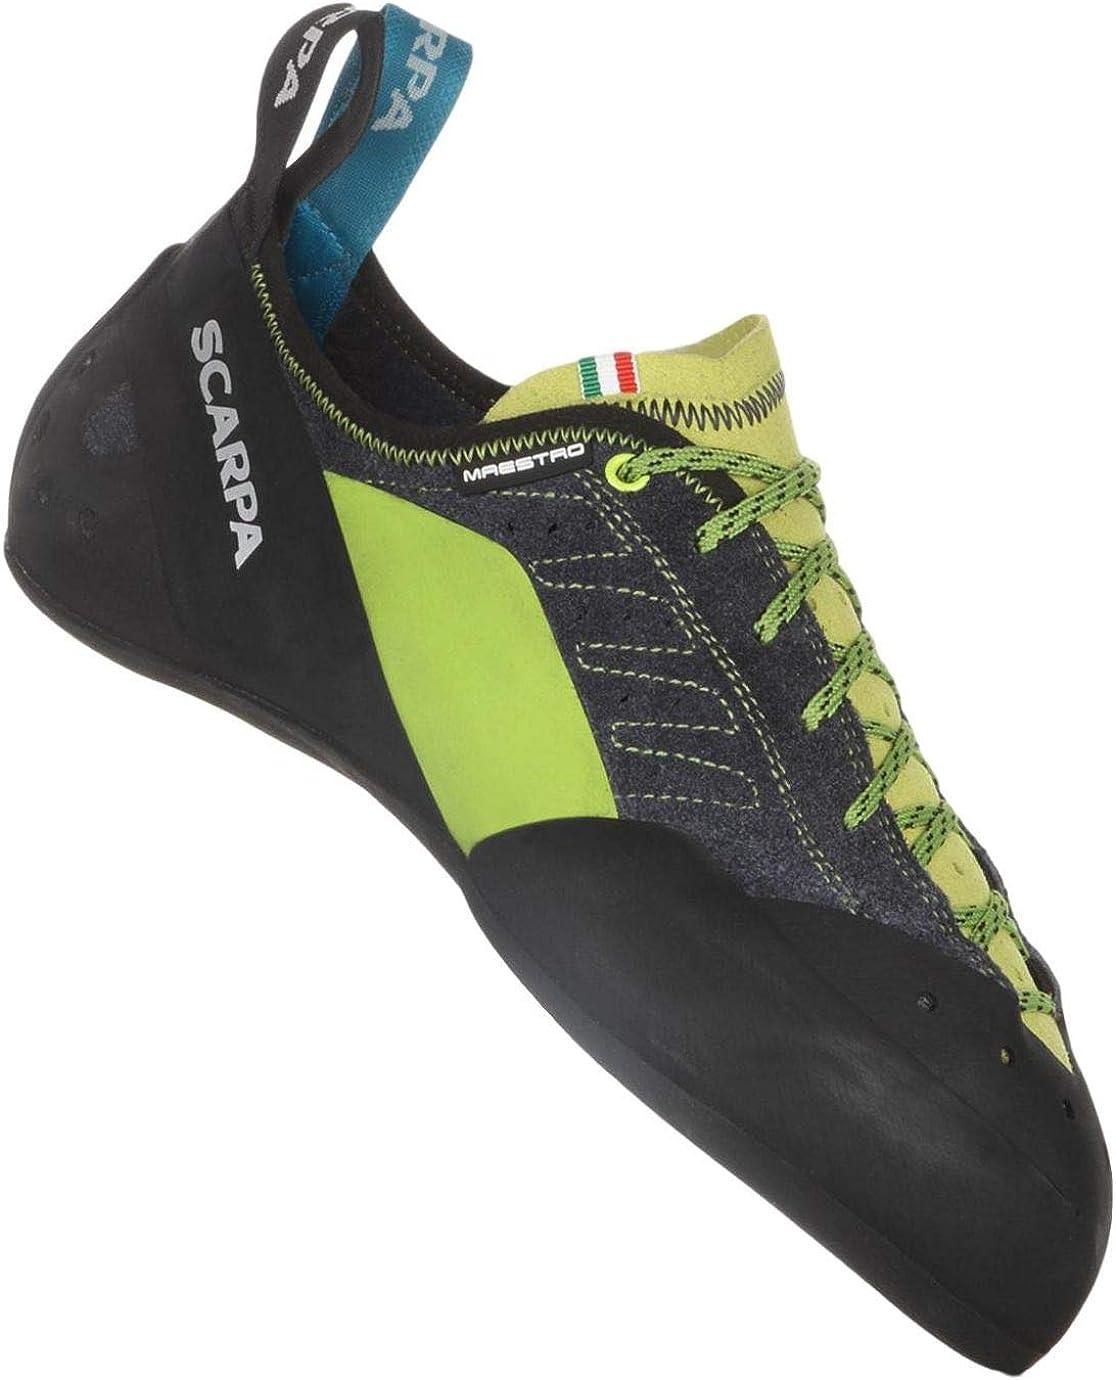 SCARPA Men's Maestro Eco Shoes In a popularity Climbing overseas Ink